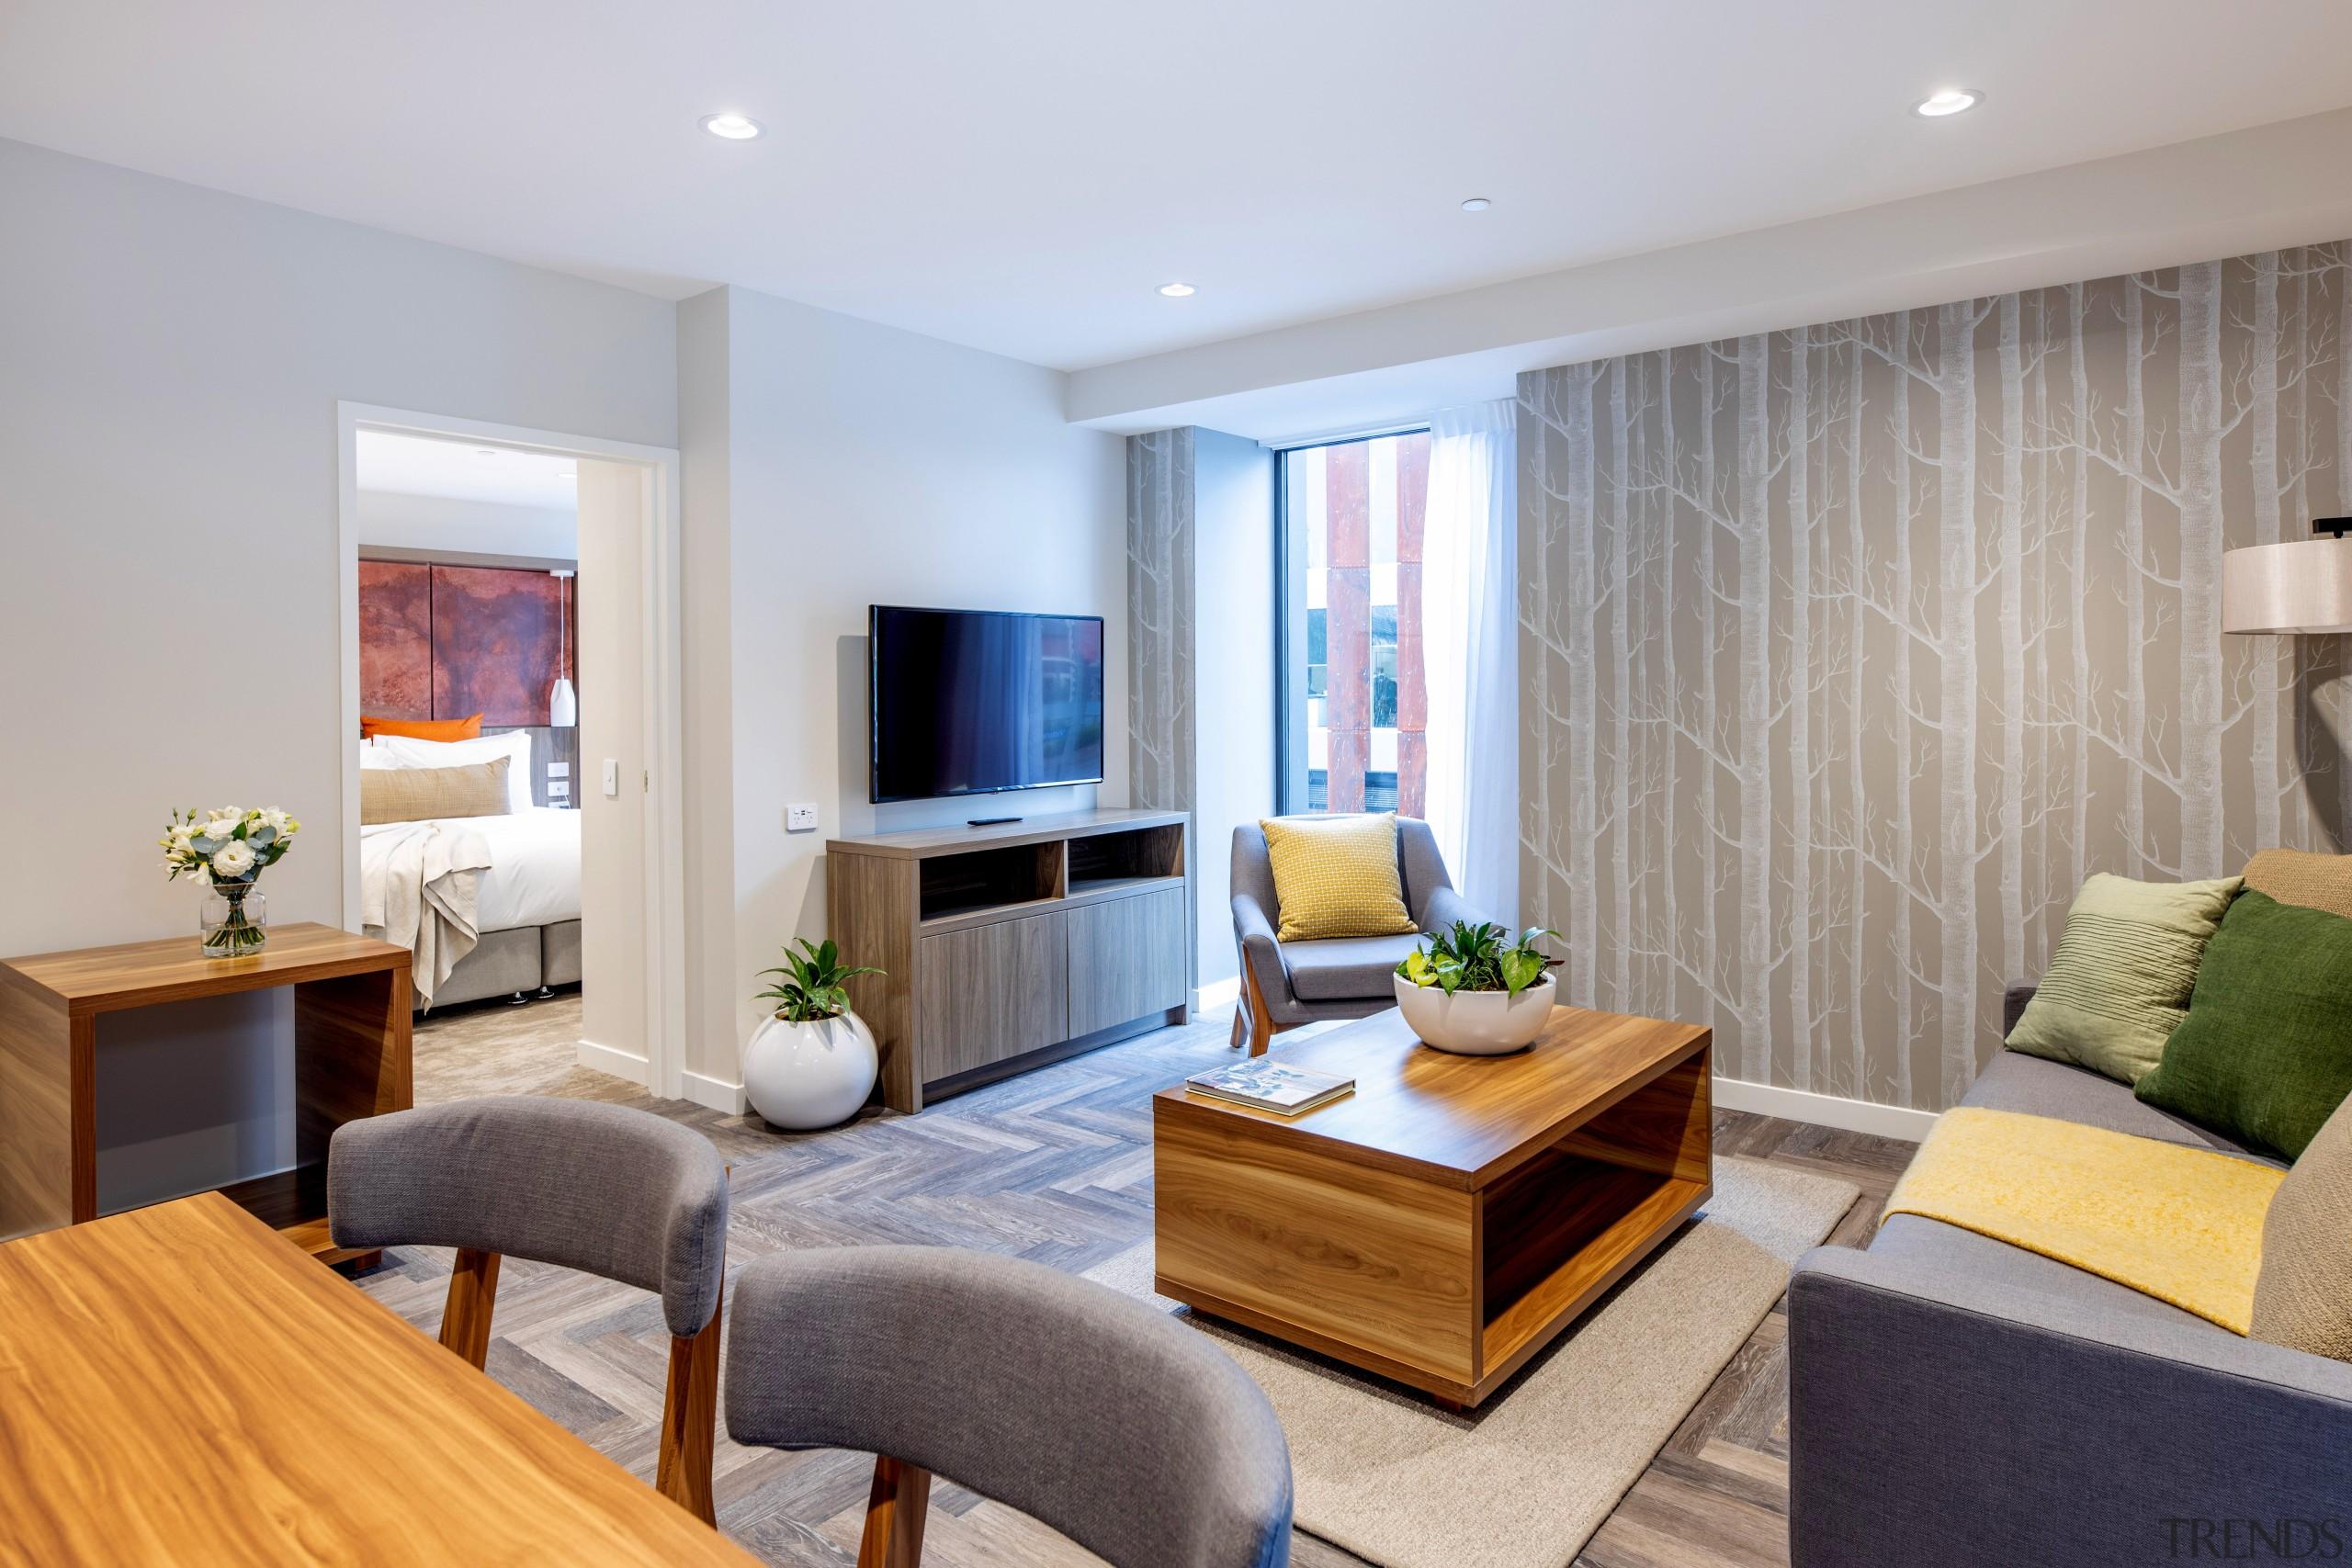 In this luxury suite at Sudima Christchurch City, Sudima Boutique Hotel, Luxury suite, Ignite Architects, Resene Paint